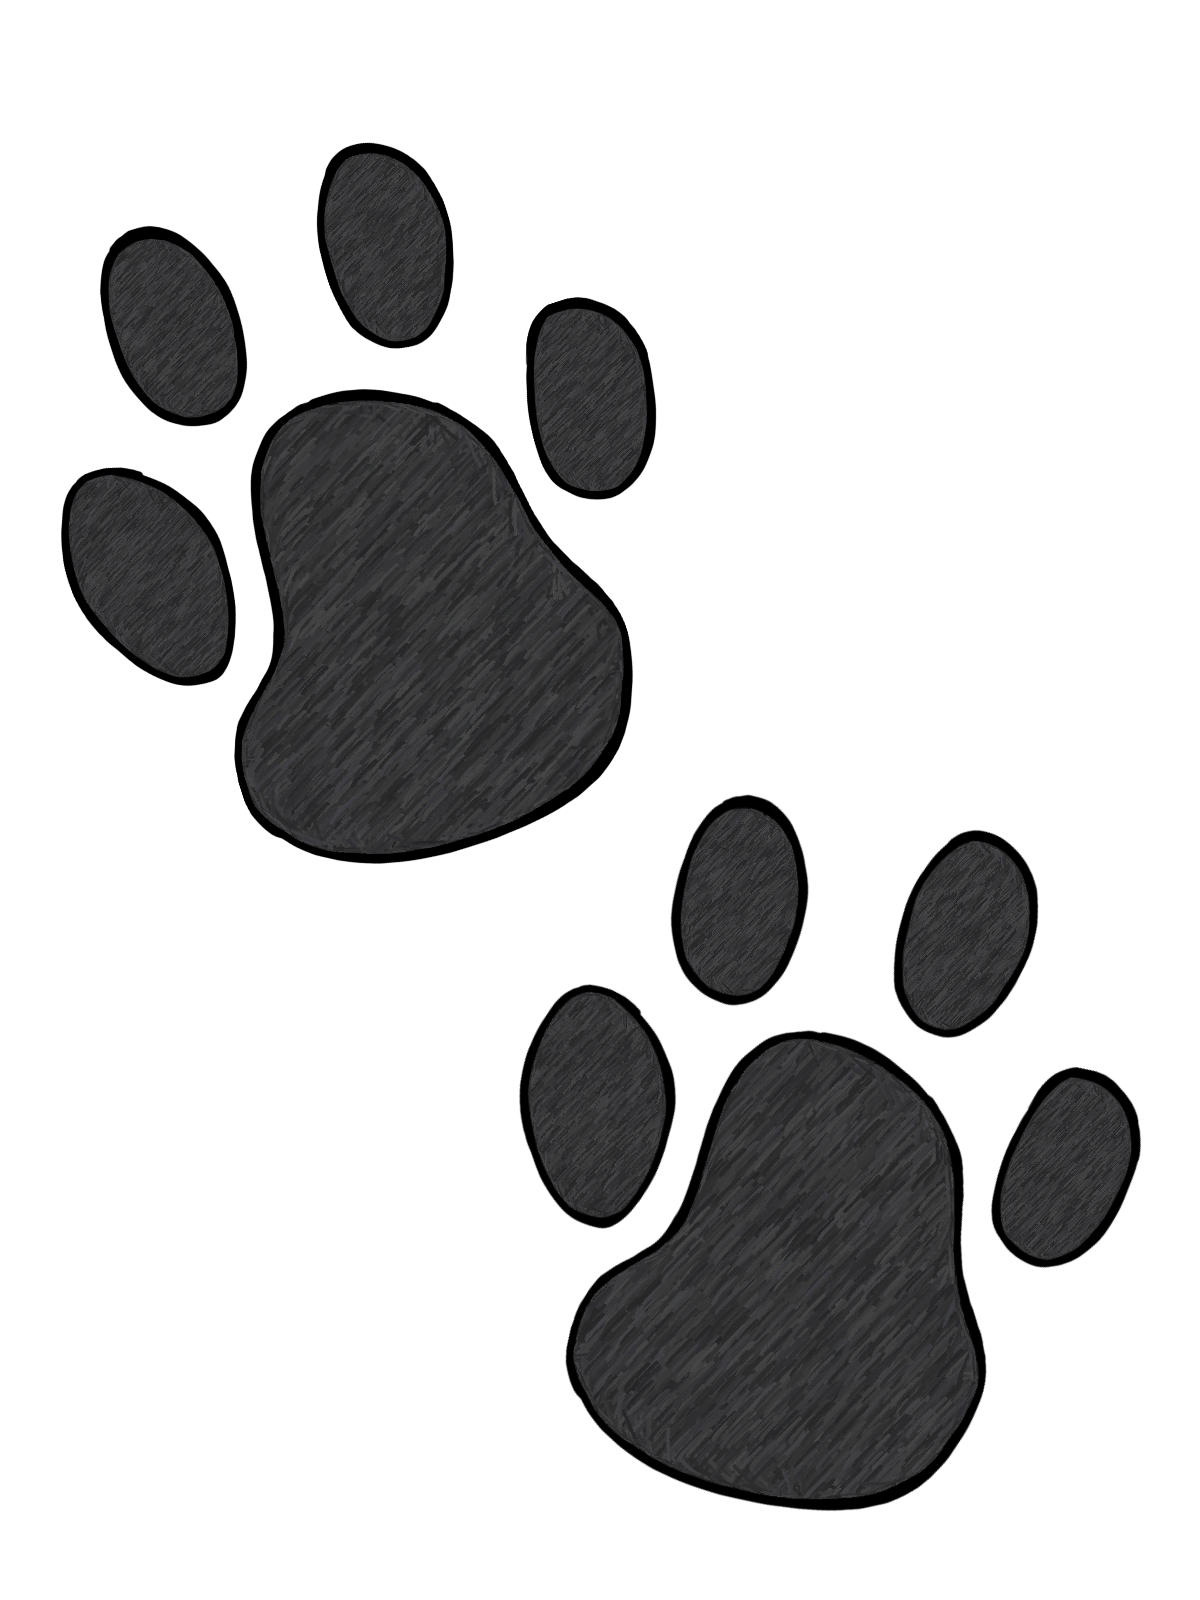 Dog print clipart free download best dog print clipart on 1200x1600 paw prints dog paw print stamps dog prints clip art 2 biocorpaavc